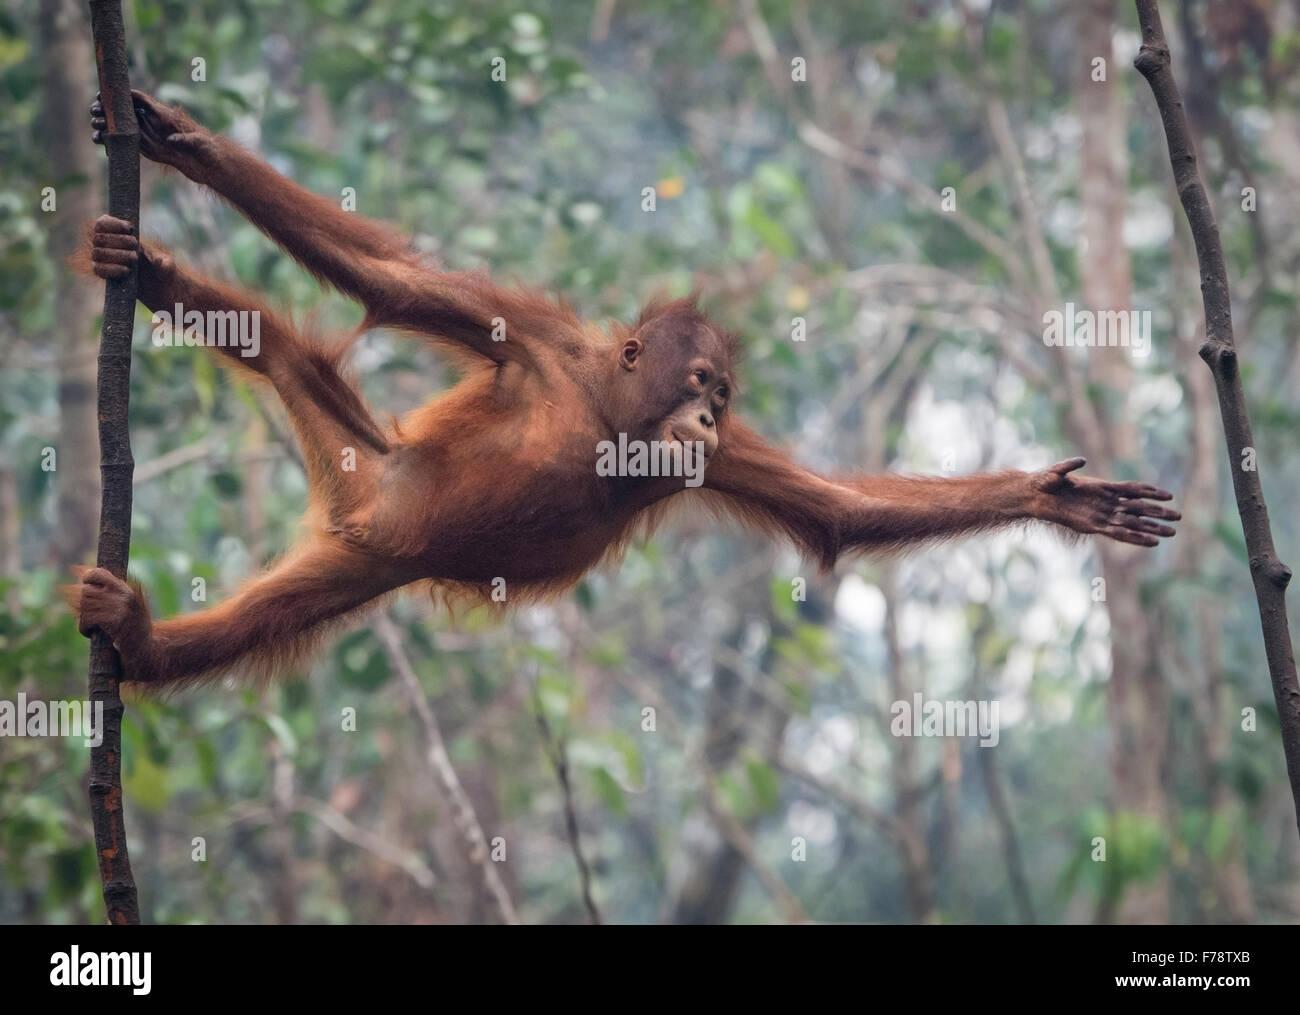 Bornean joven orangután (Pongo pygmoeus) se estira para alcanzar siguiente árbol Imagen De Stock